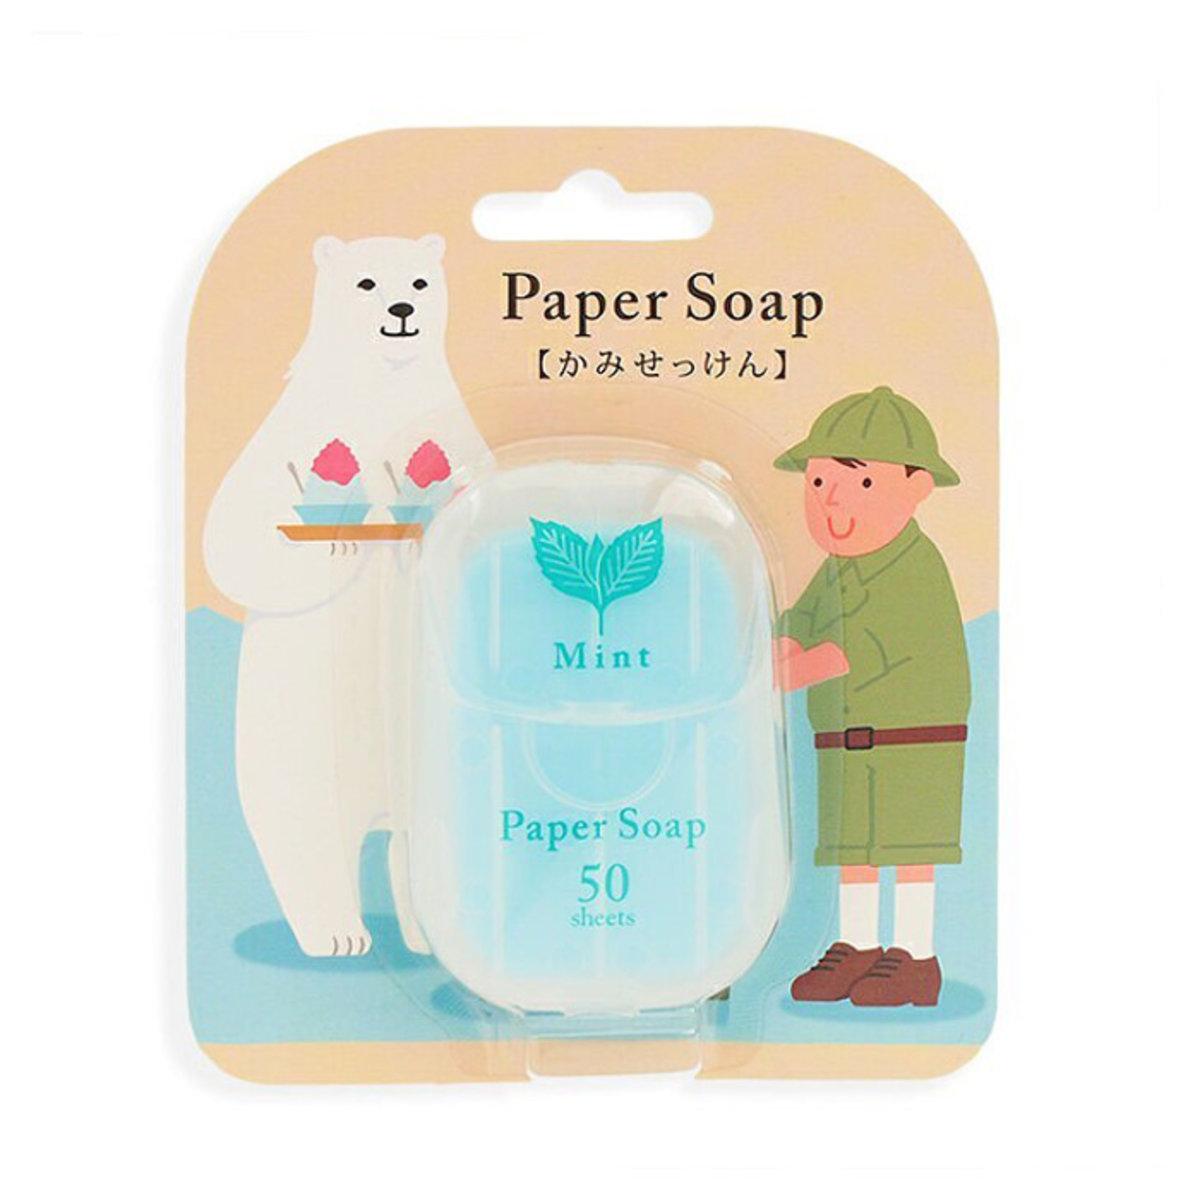 Paper Soap - mint / 50pcs (4975541093766)